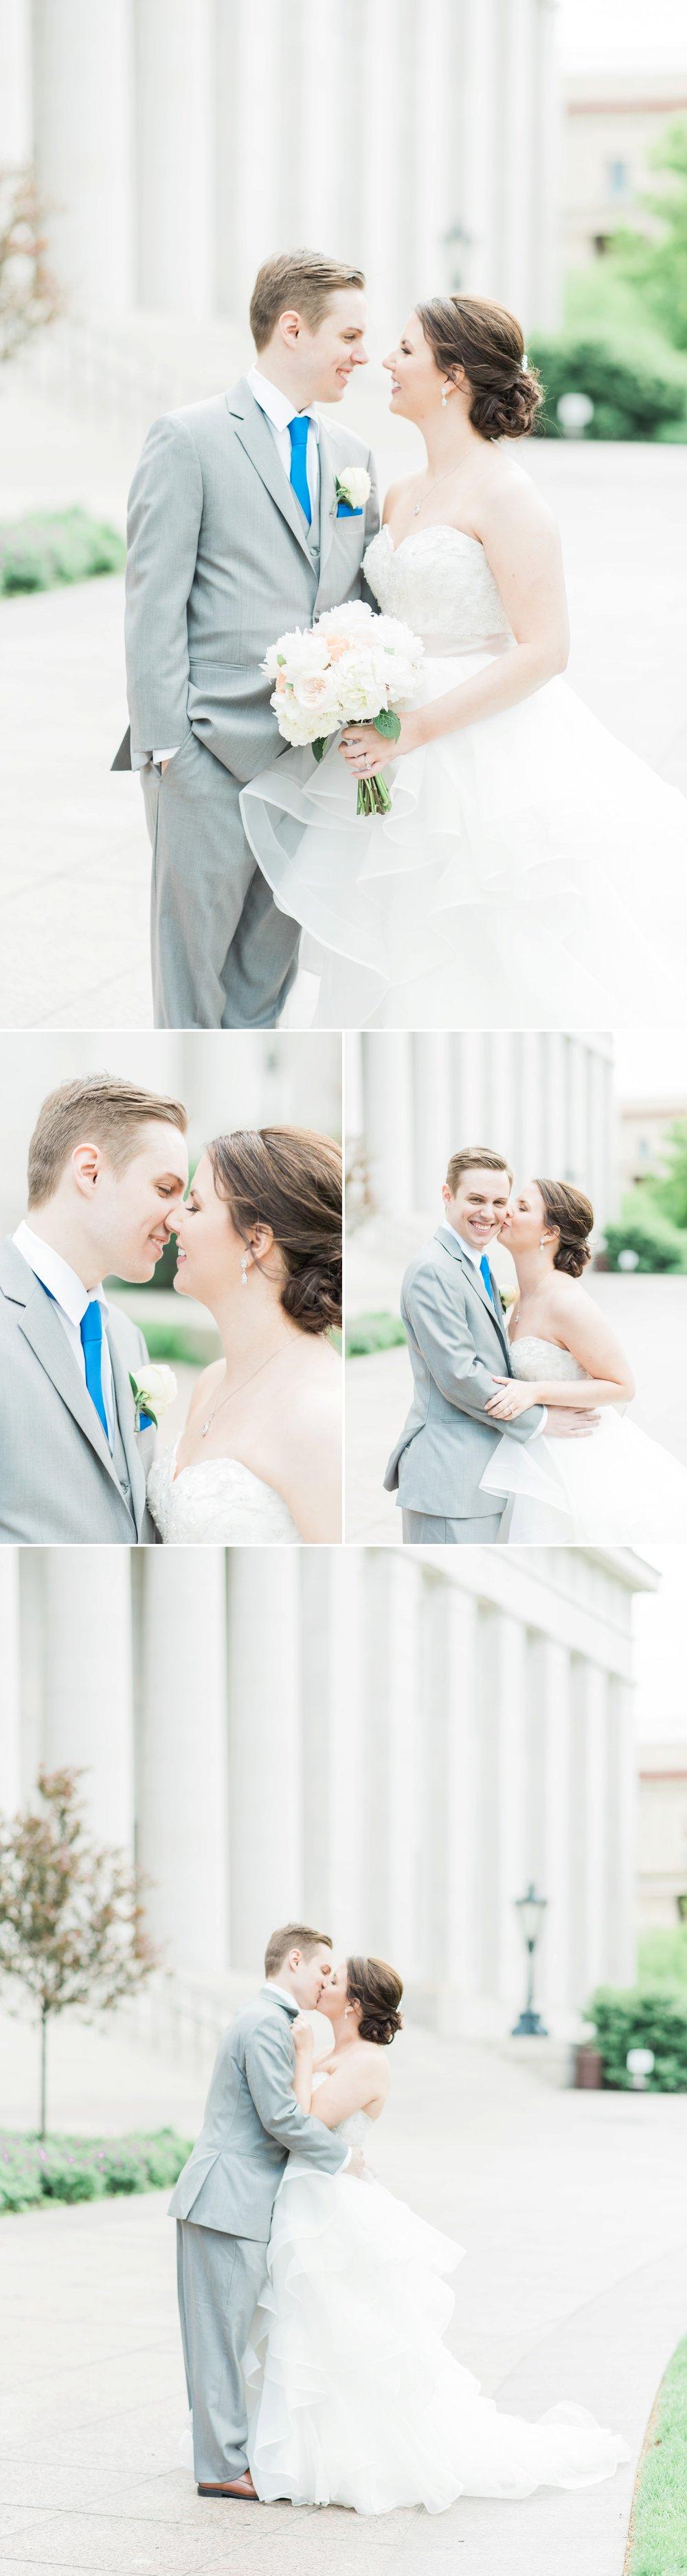 the-vault-columbus-ohio-wedding-emily-chris_0029.jpg